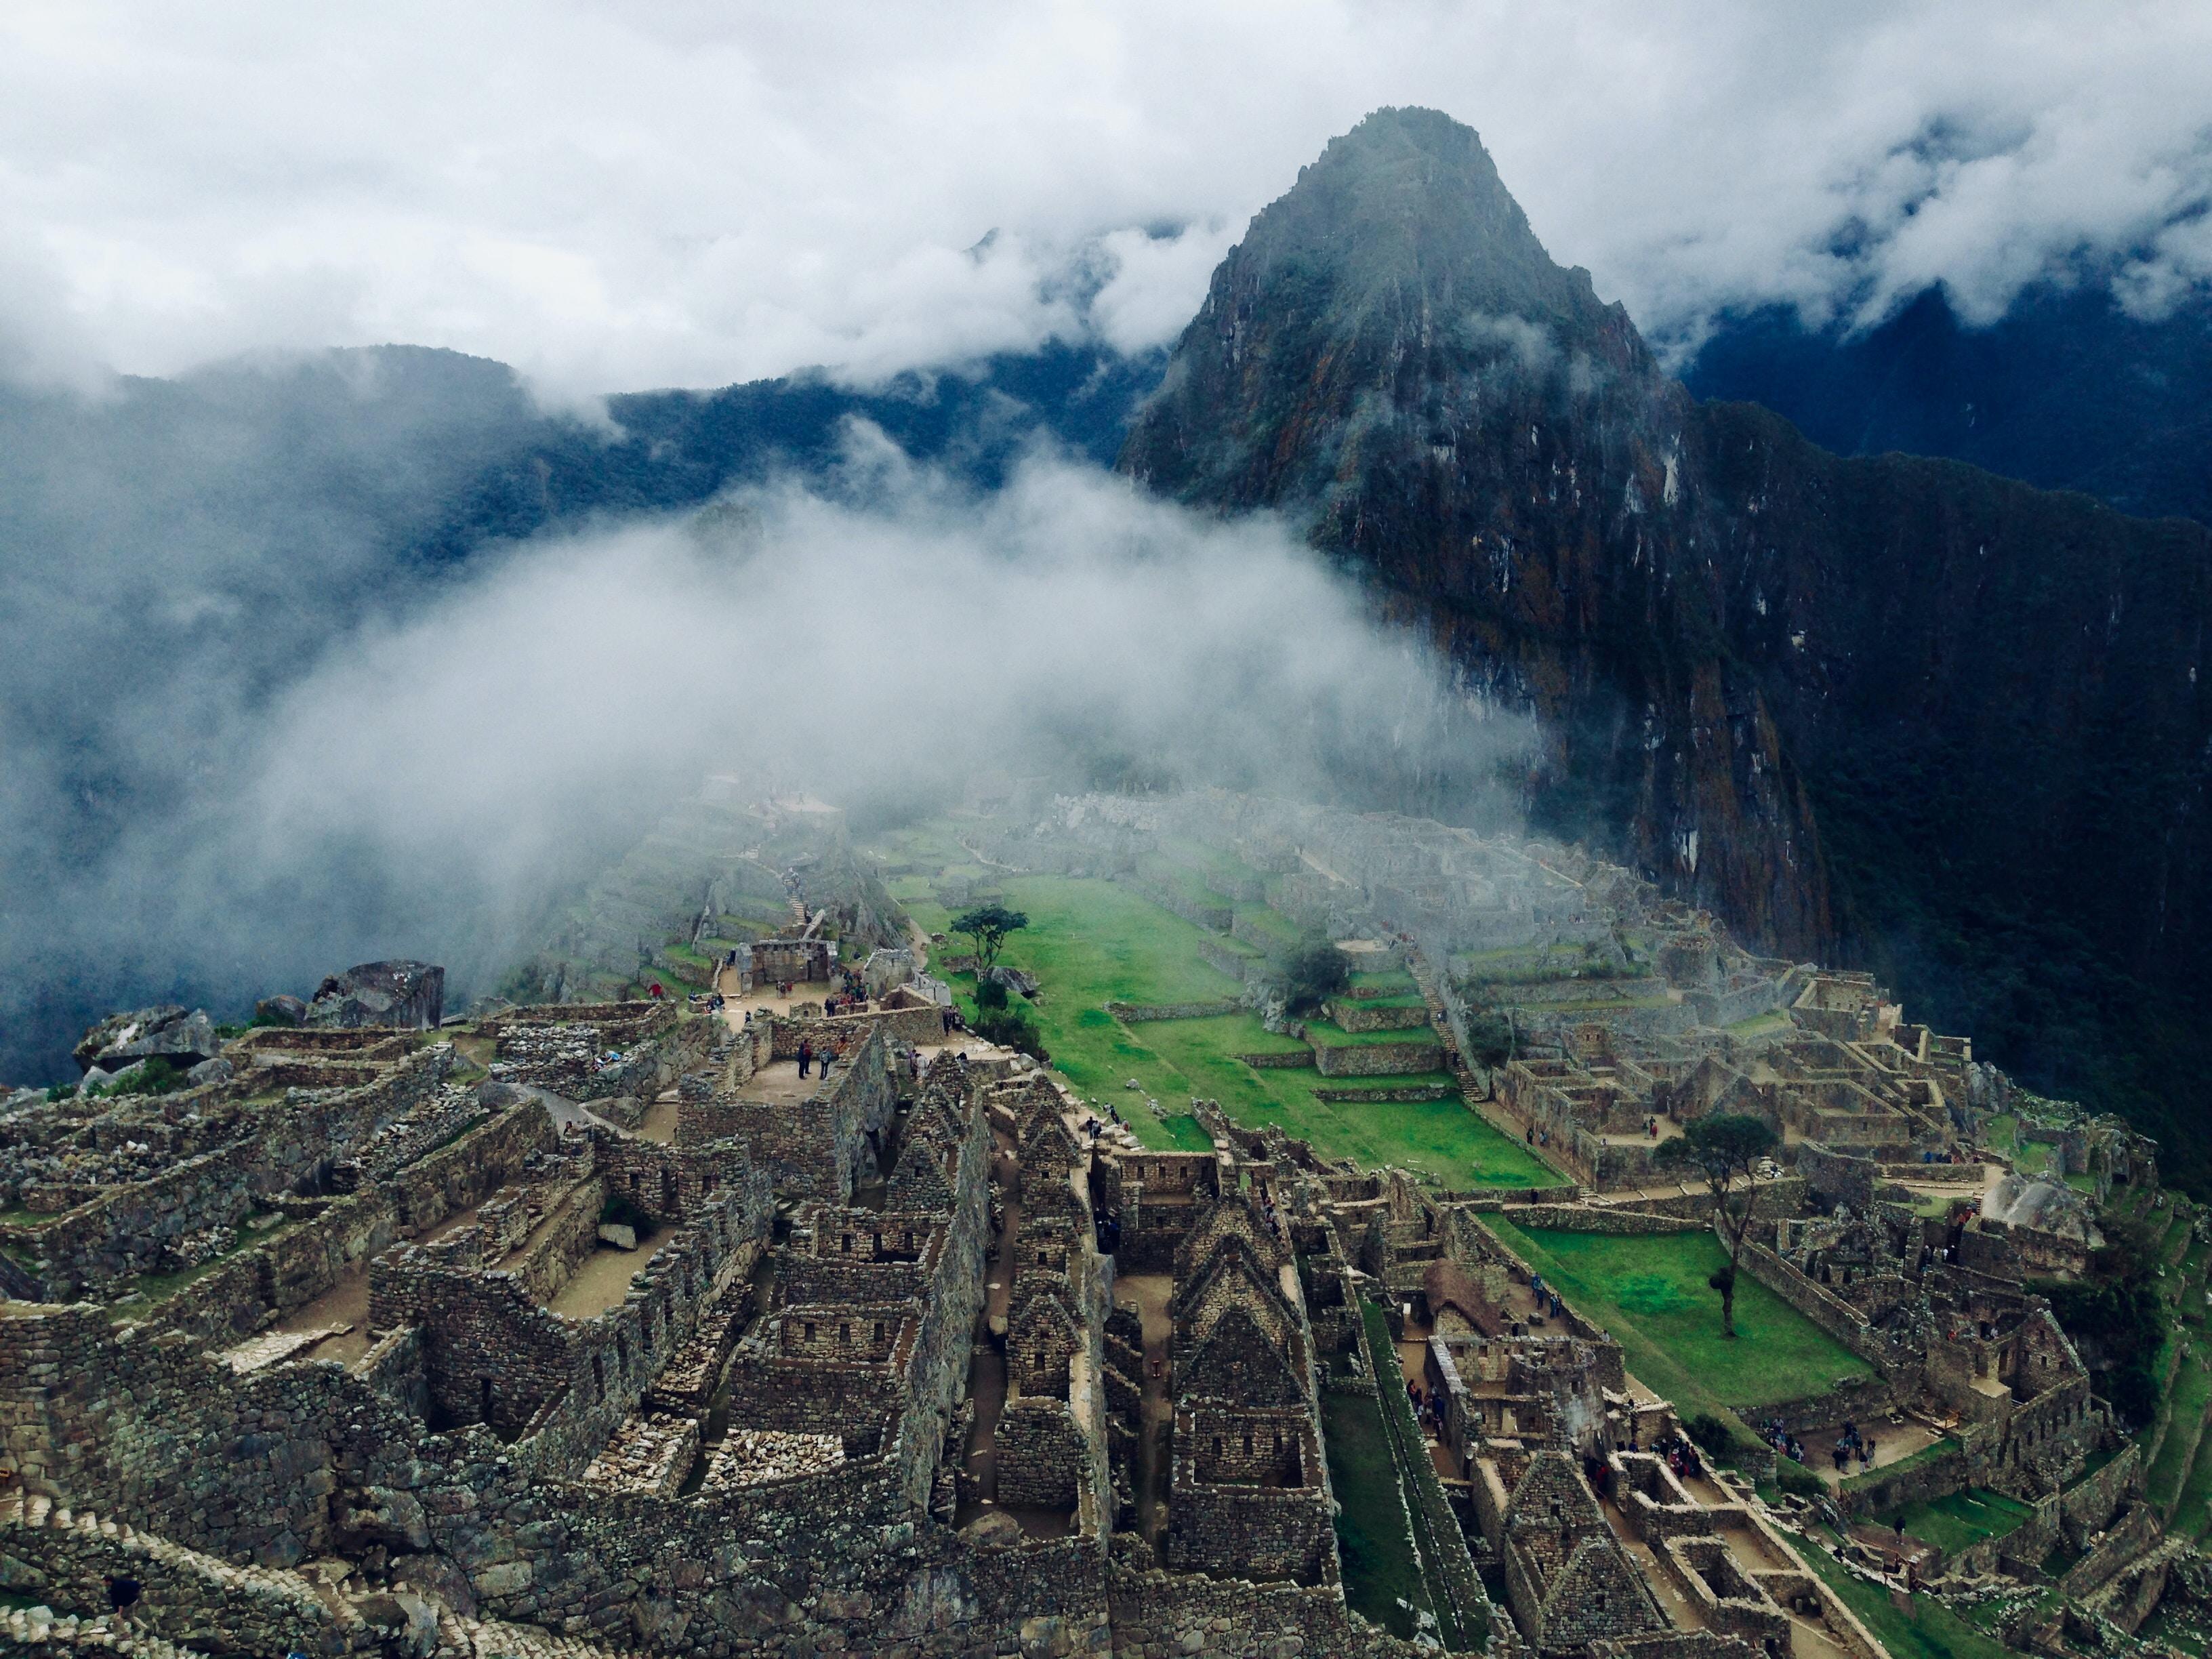 bird's-eye view of village in between mountain